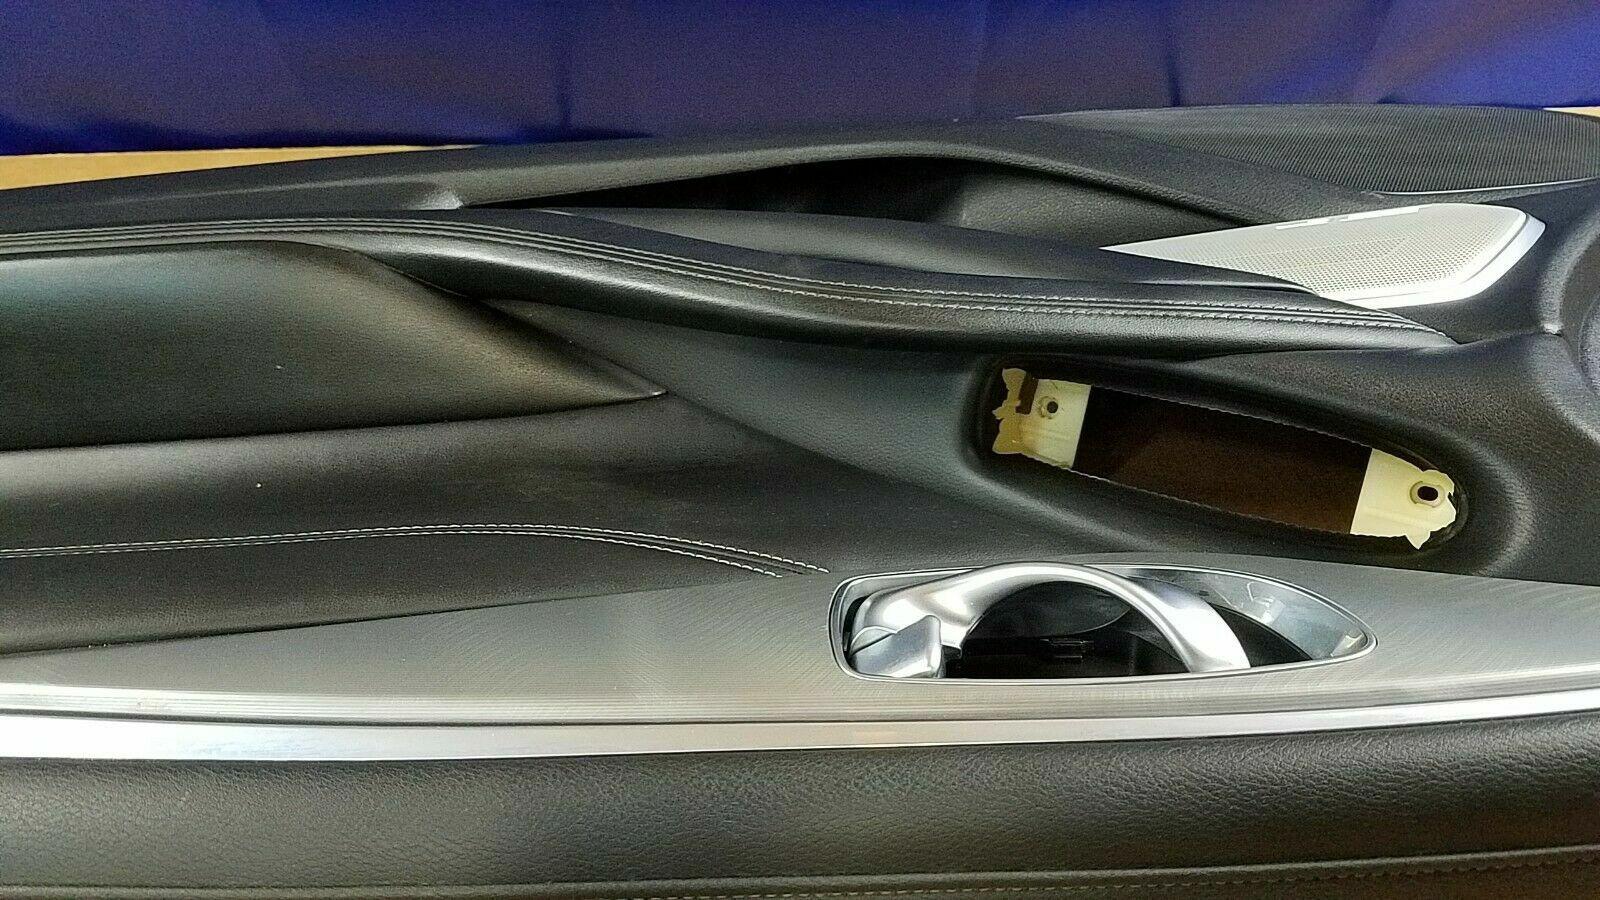 2017-2020 INFINITI Q60 FRONT RIGHT PASSENGER SIDE DOOR TRIM PANEL BLACK # 69374